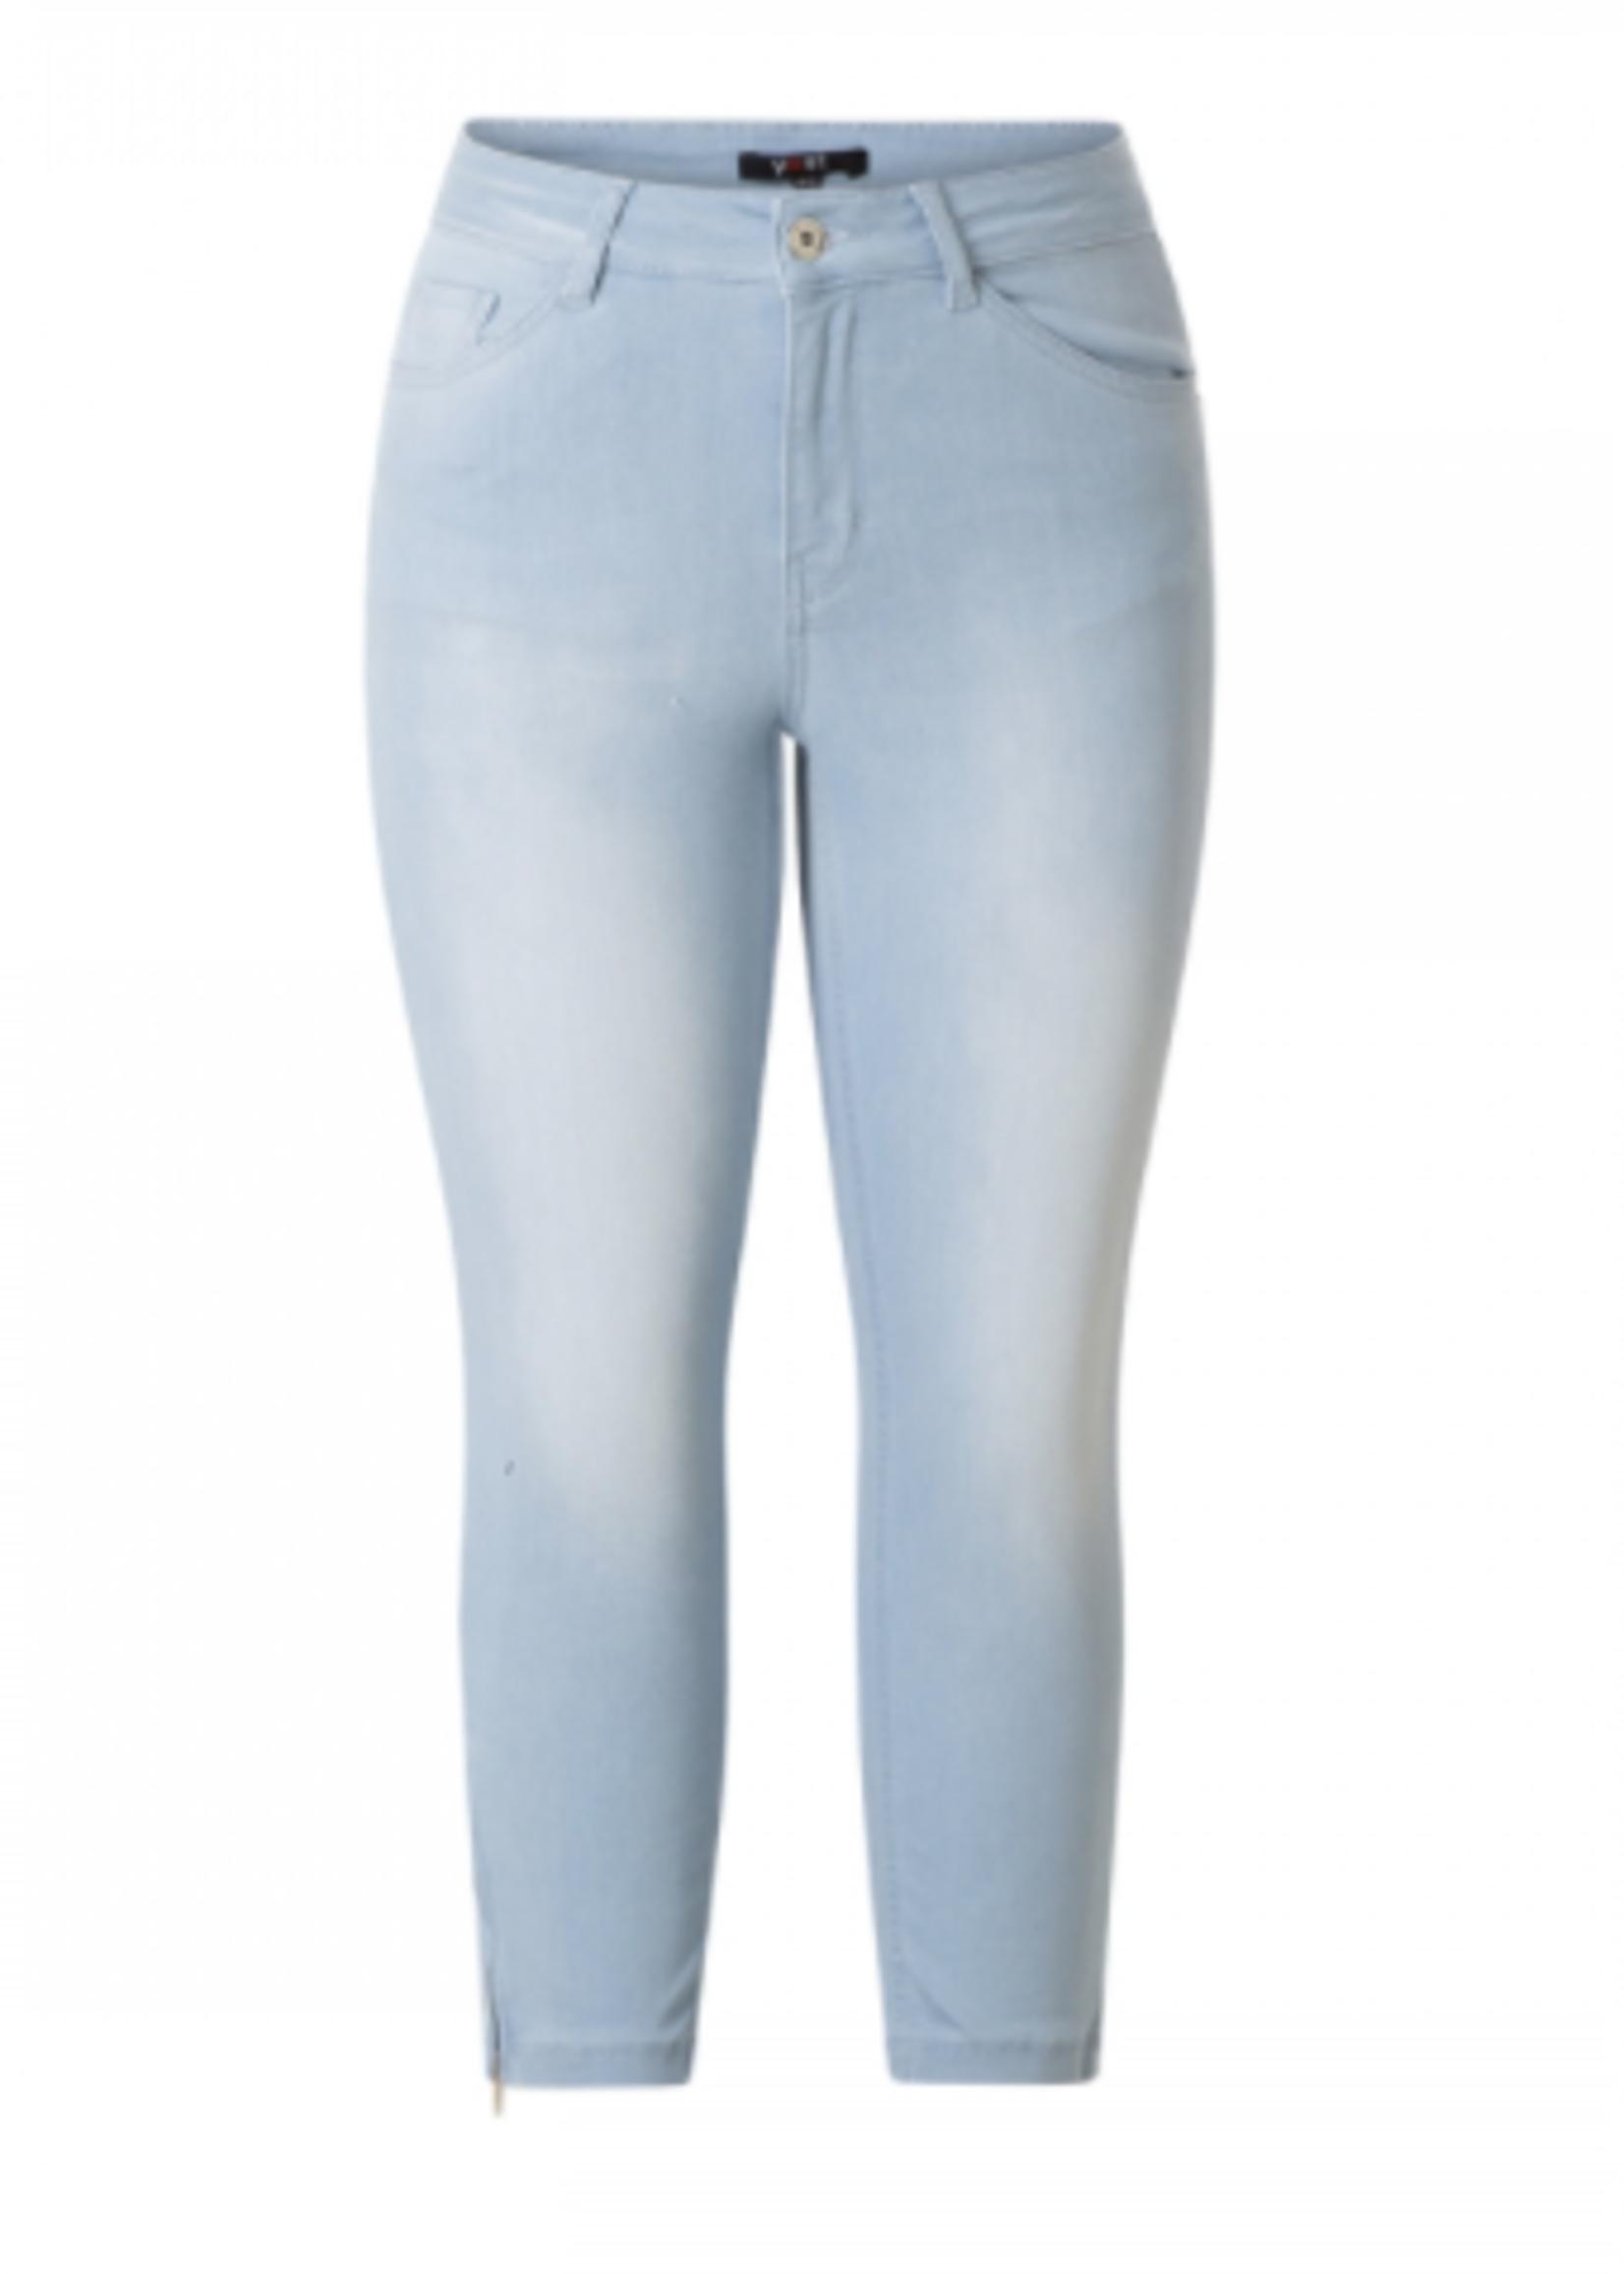 Yest Yest Bleach  Blue Denim Cropped Jeans